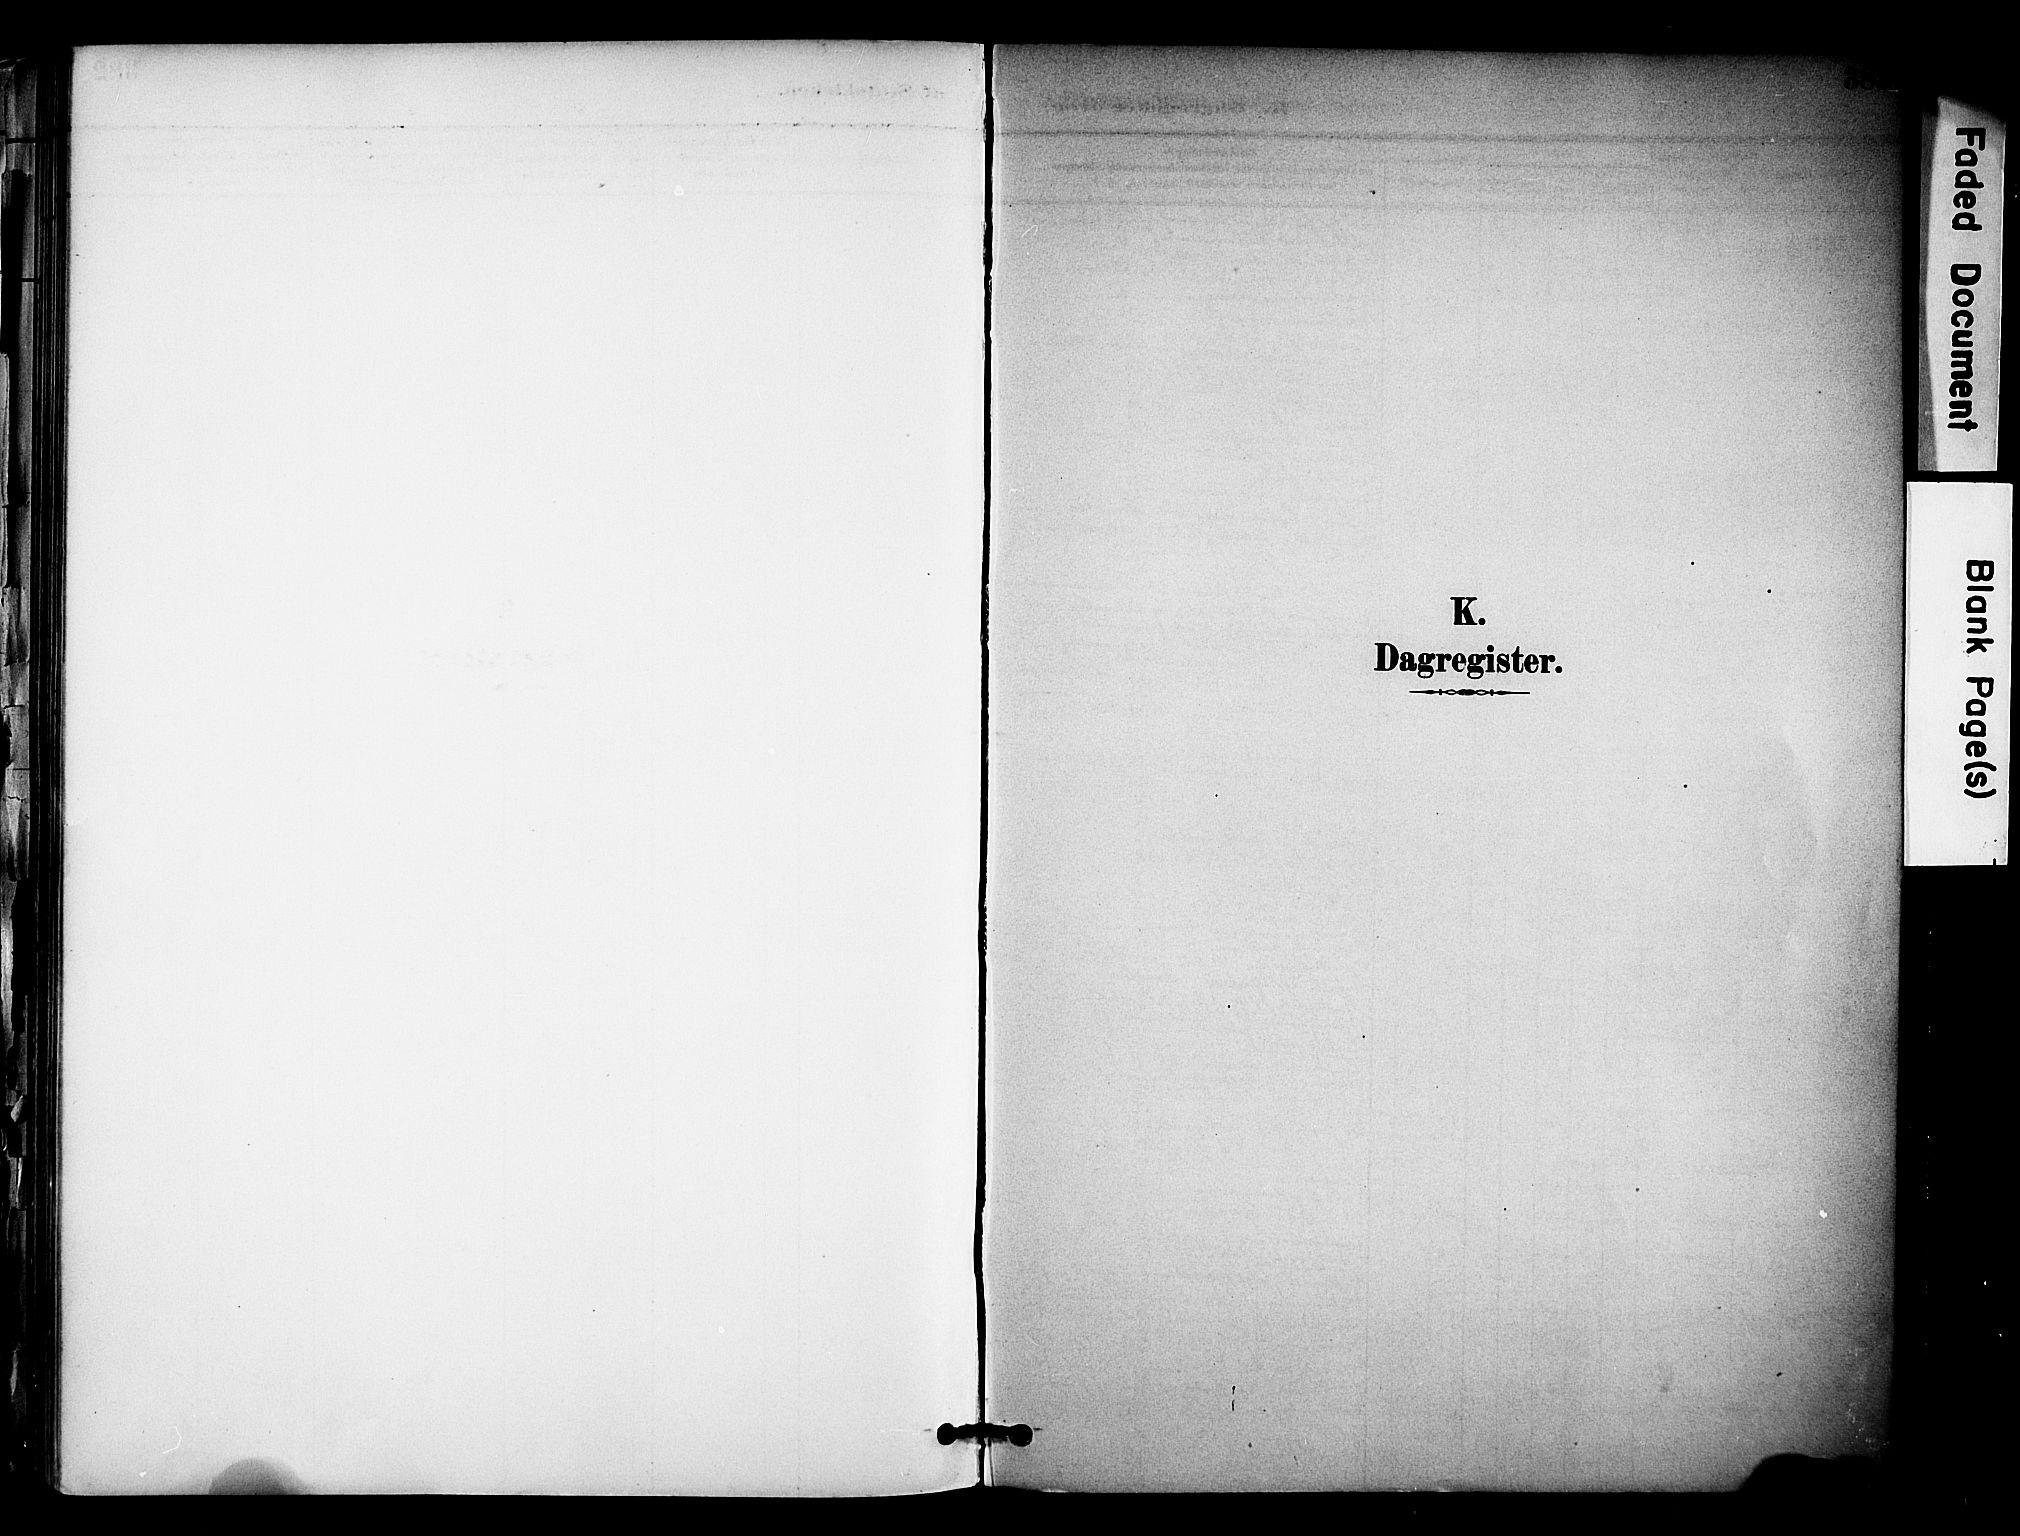 SAKO, Solum kirkebøker, F/Fa/L0010: Ministerialbok nr. I 10, 1888-1898, s. 383